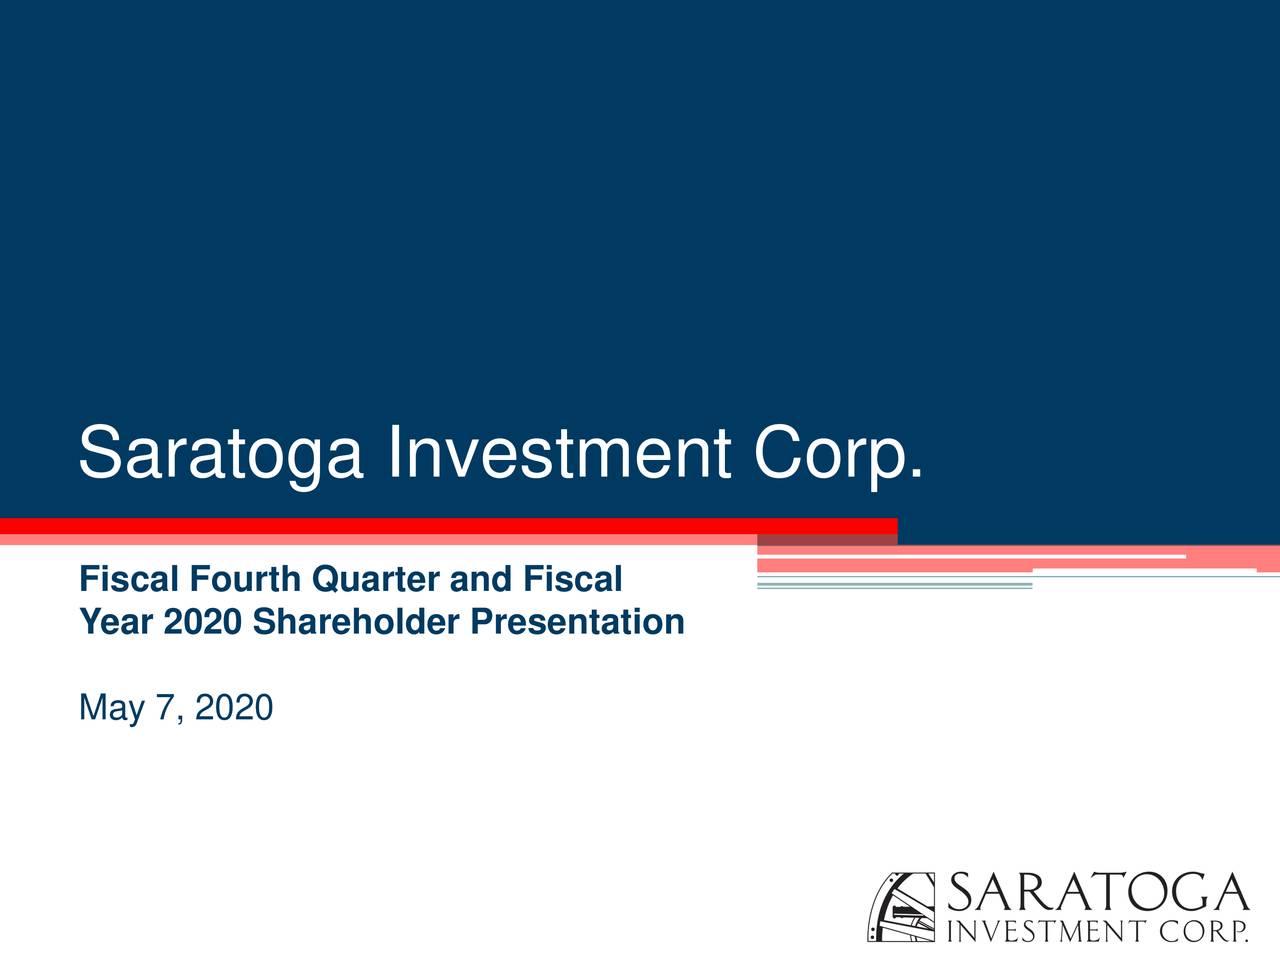 Saratoga investment corp dividend mitsui fudosan investment advisors inc